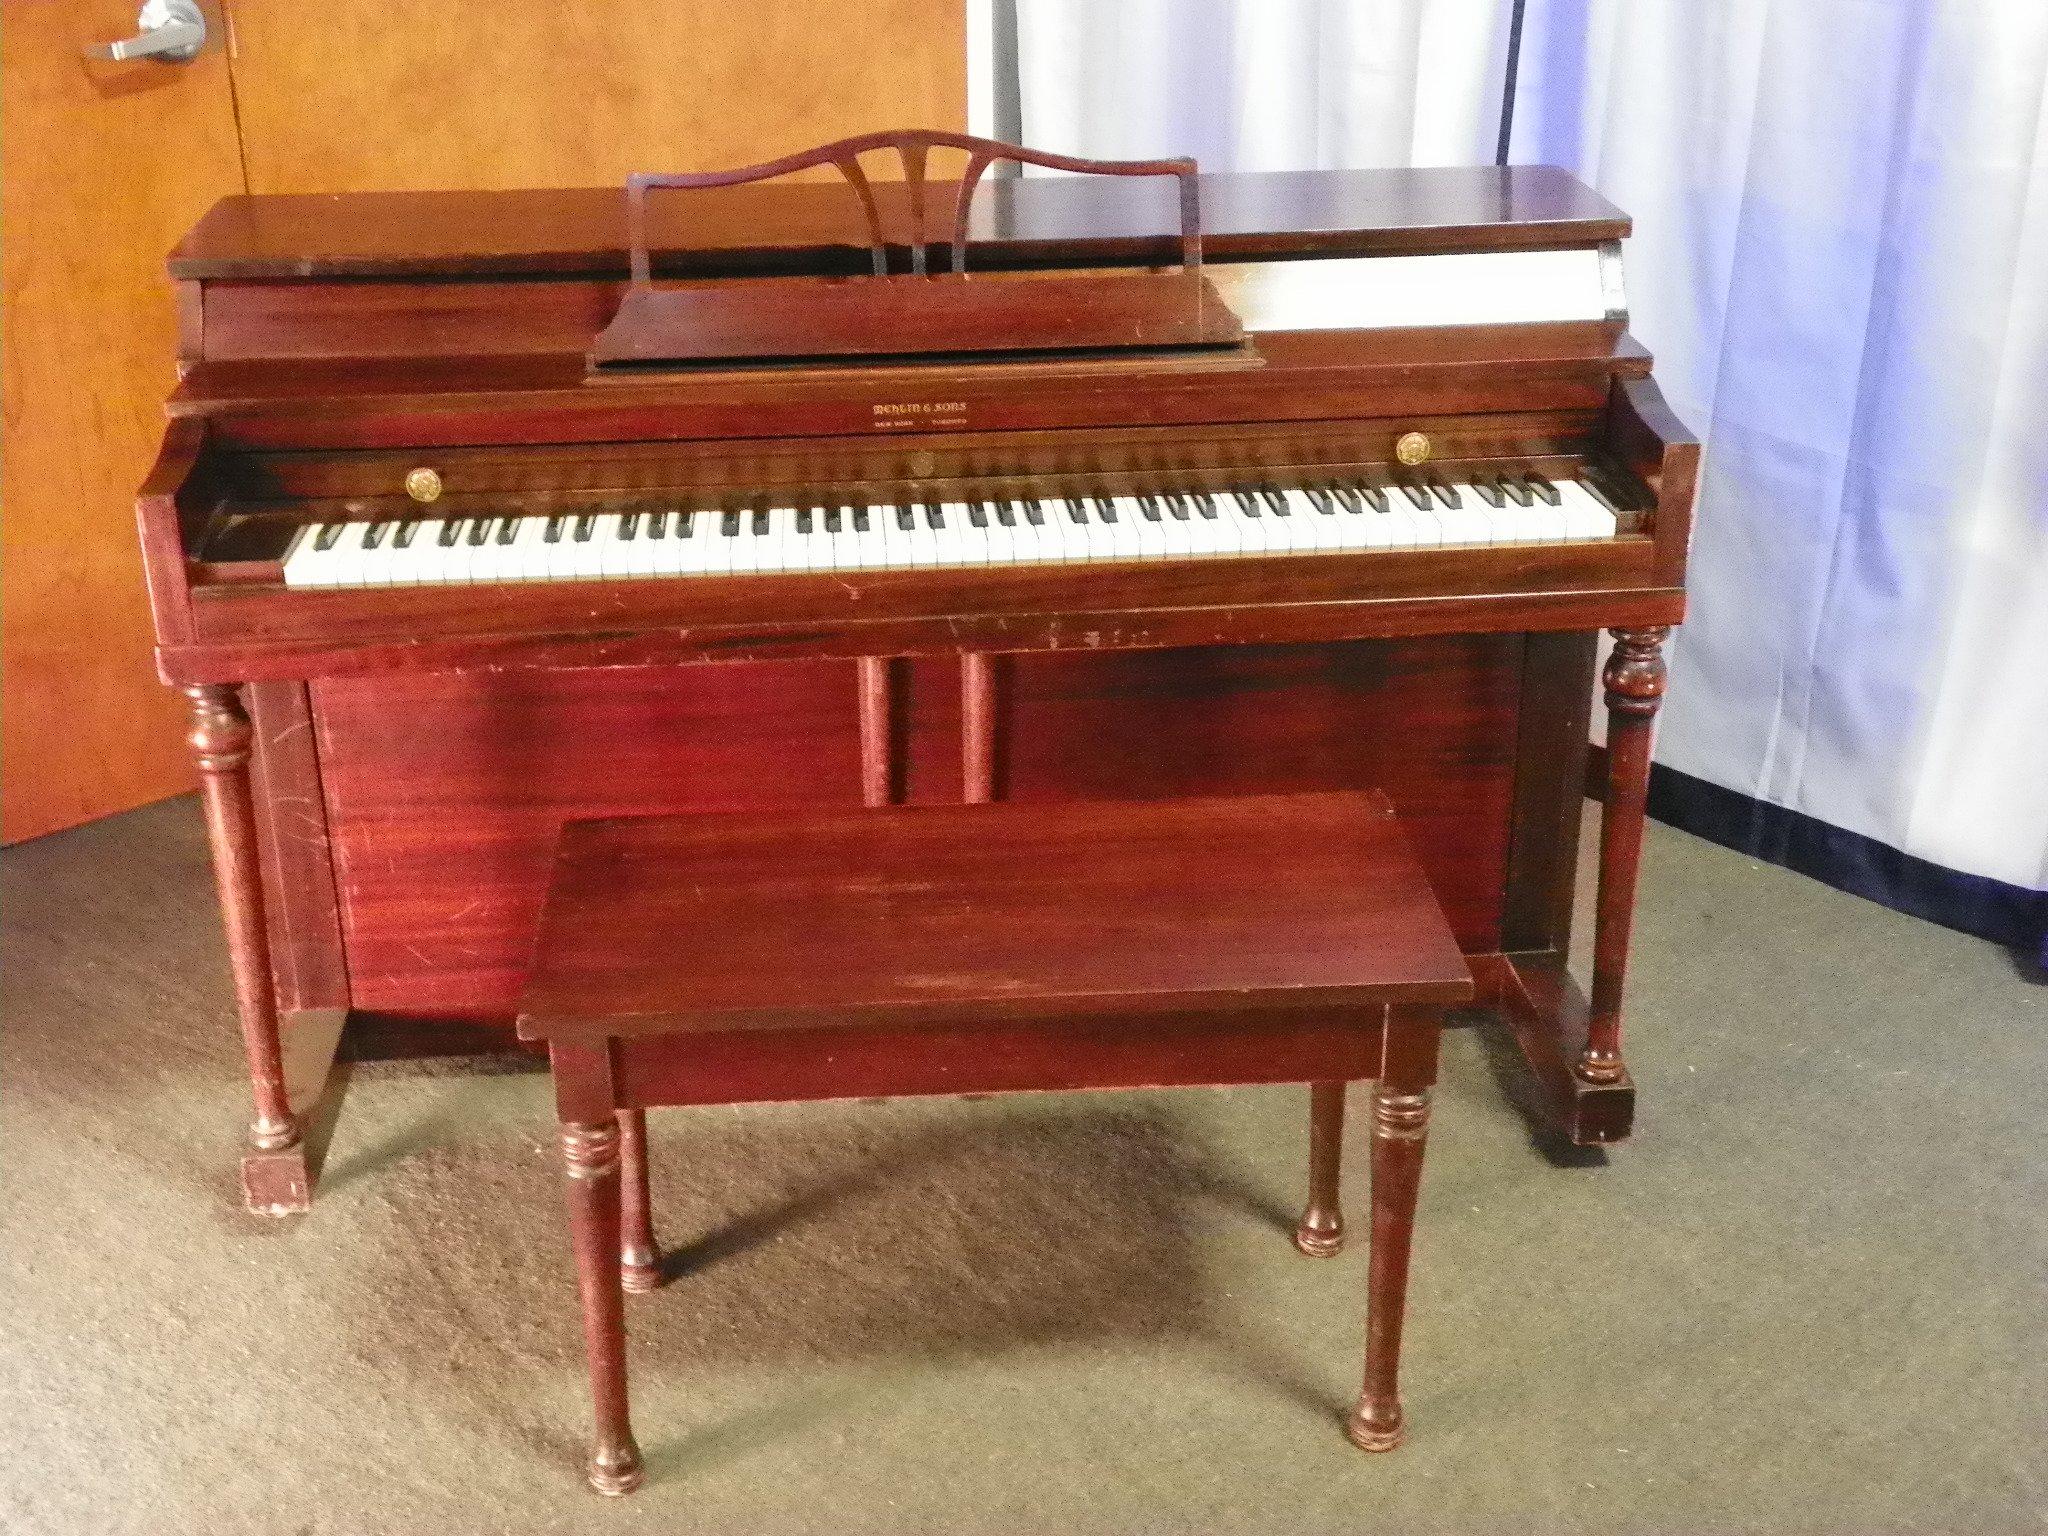 Mehlin Piano | England Piano